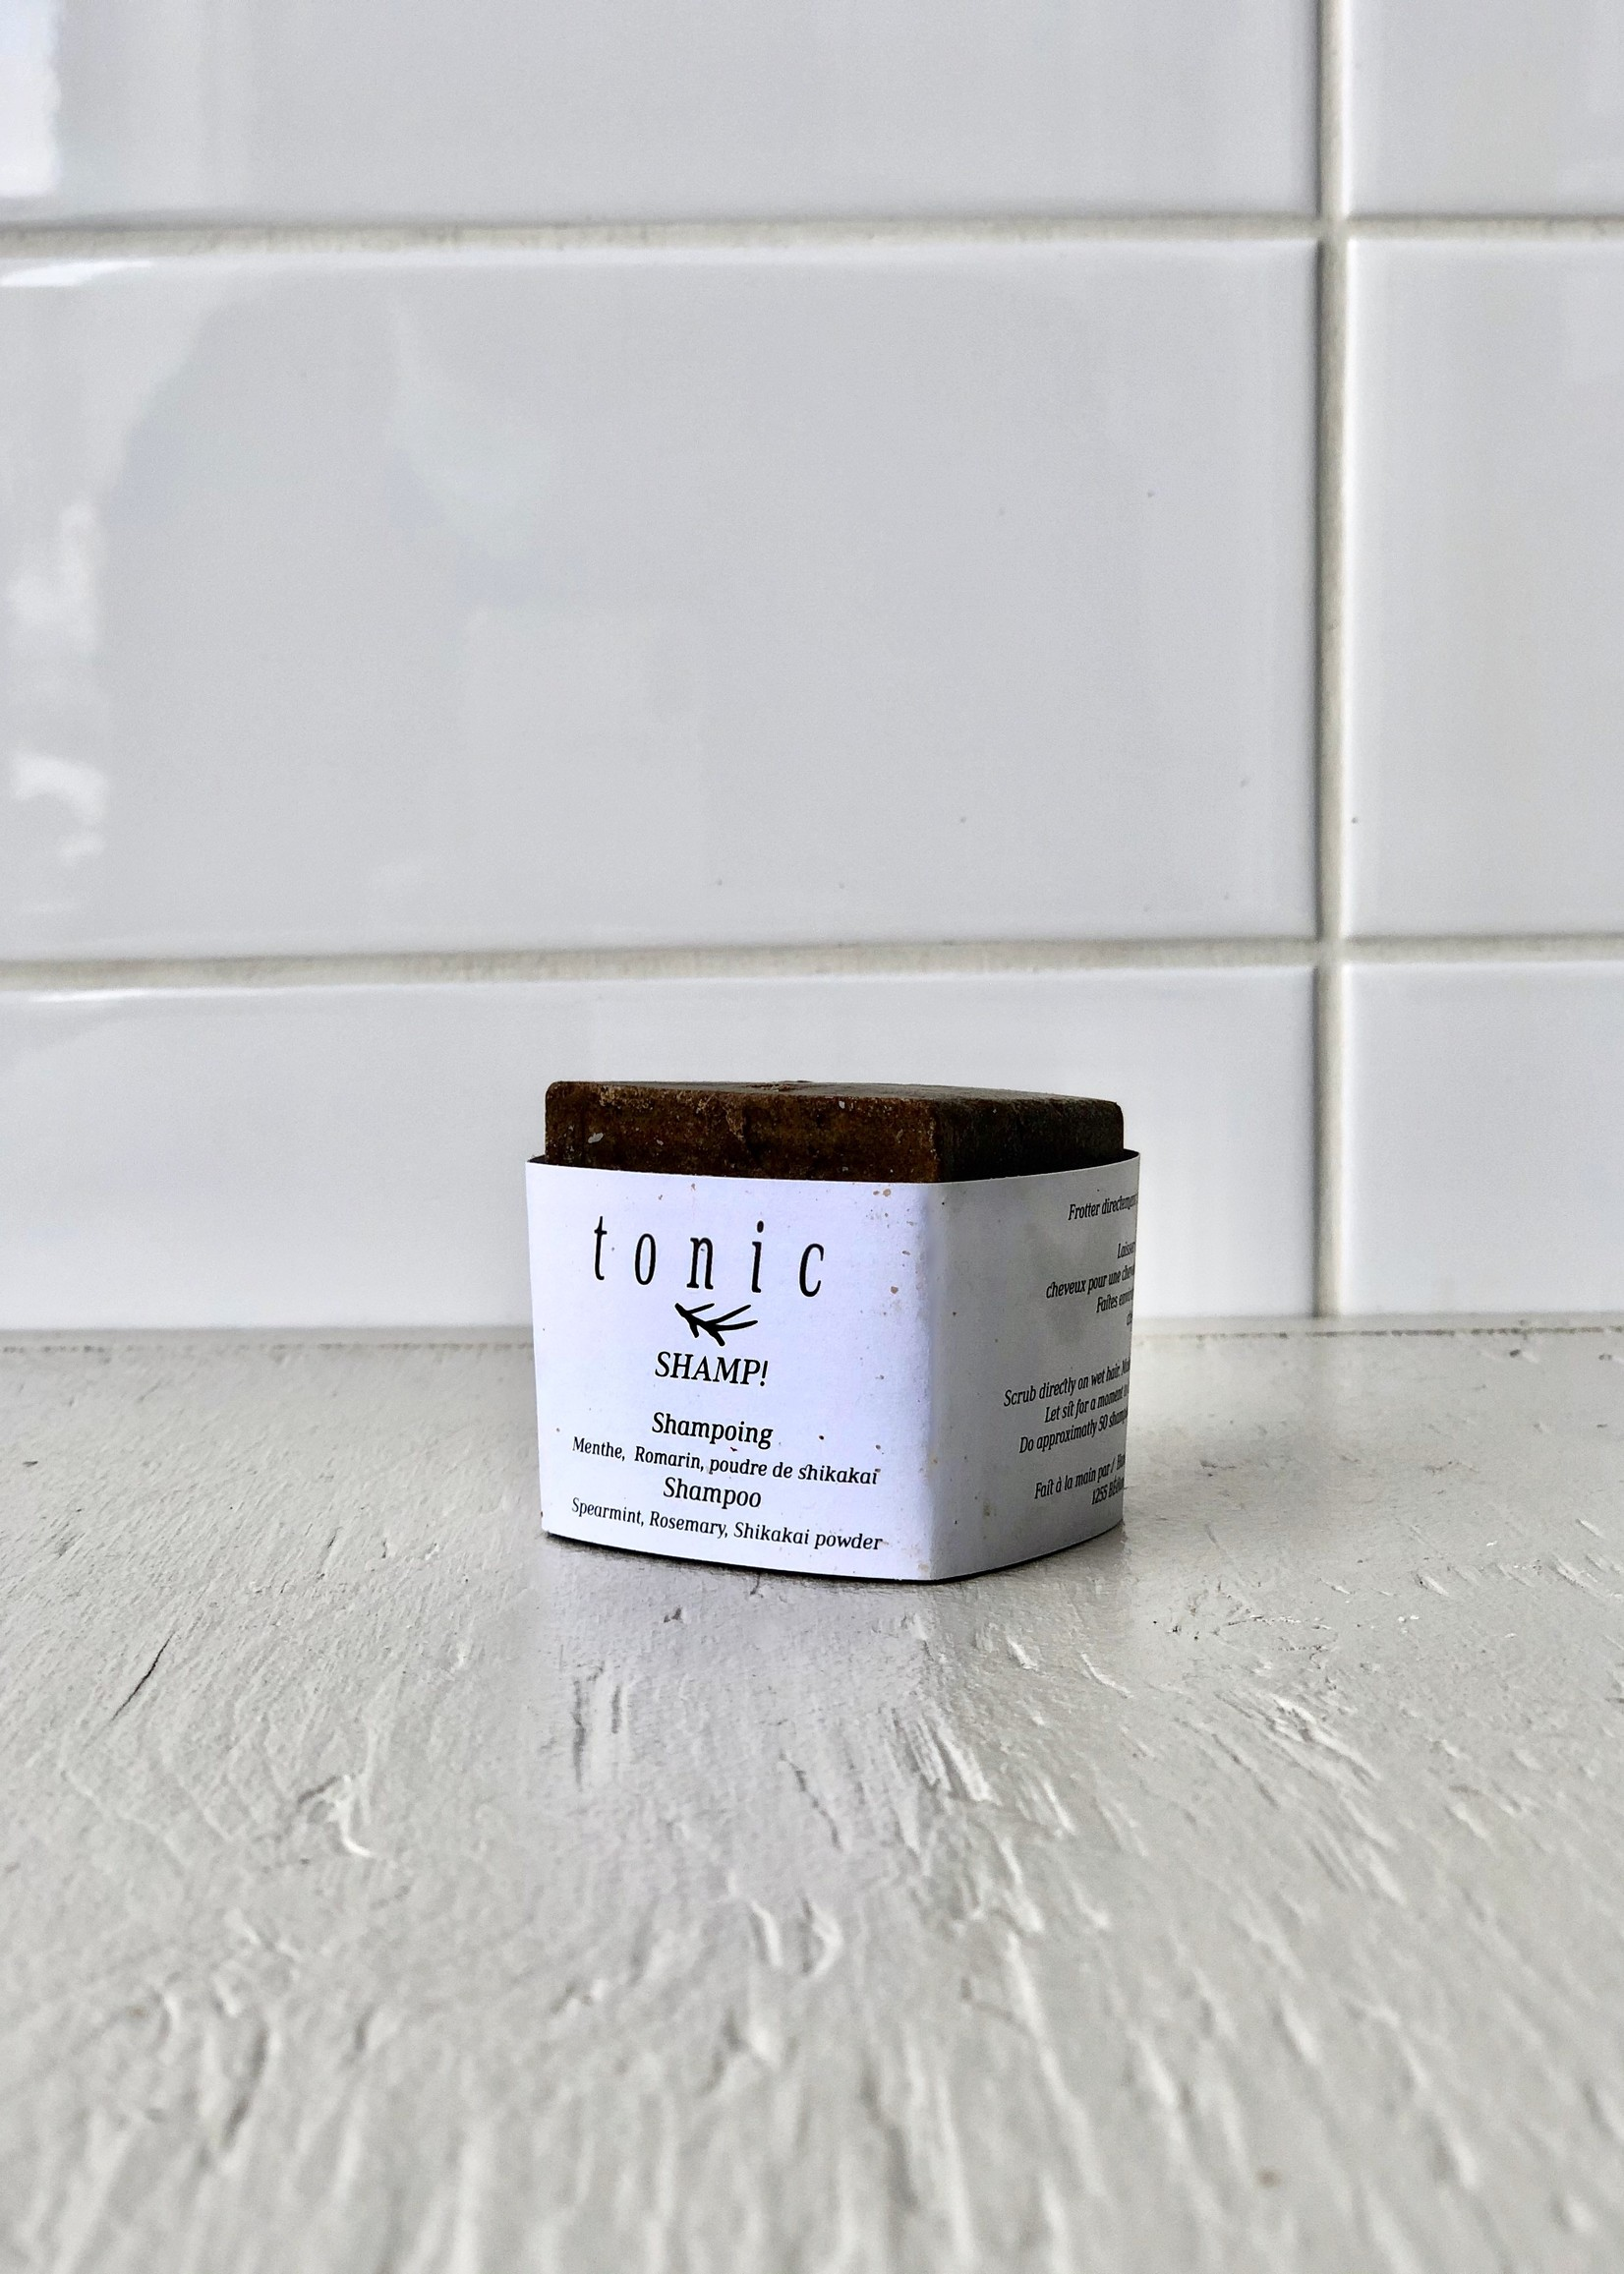 Tonic Tonic Shampoo Bar